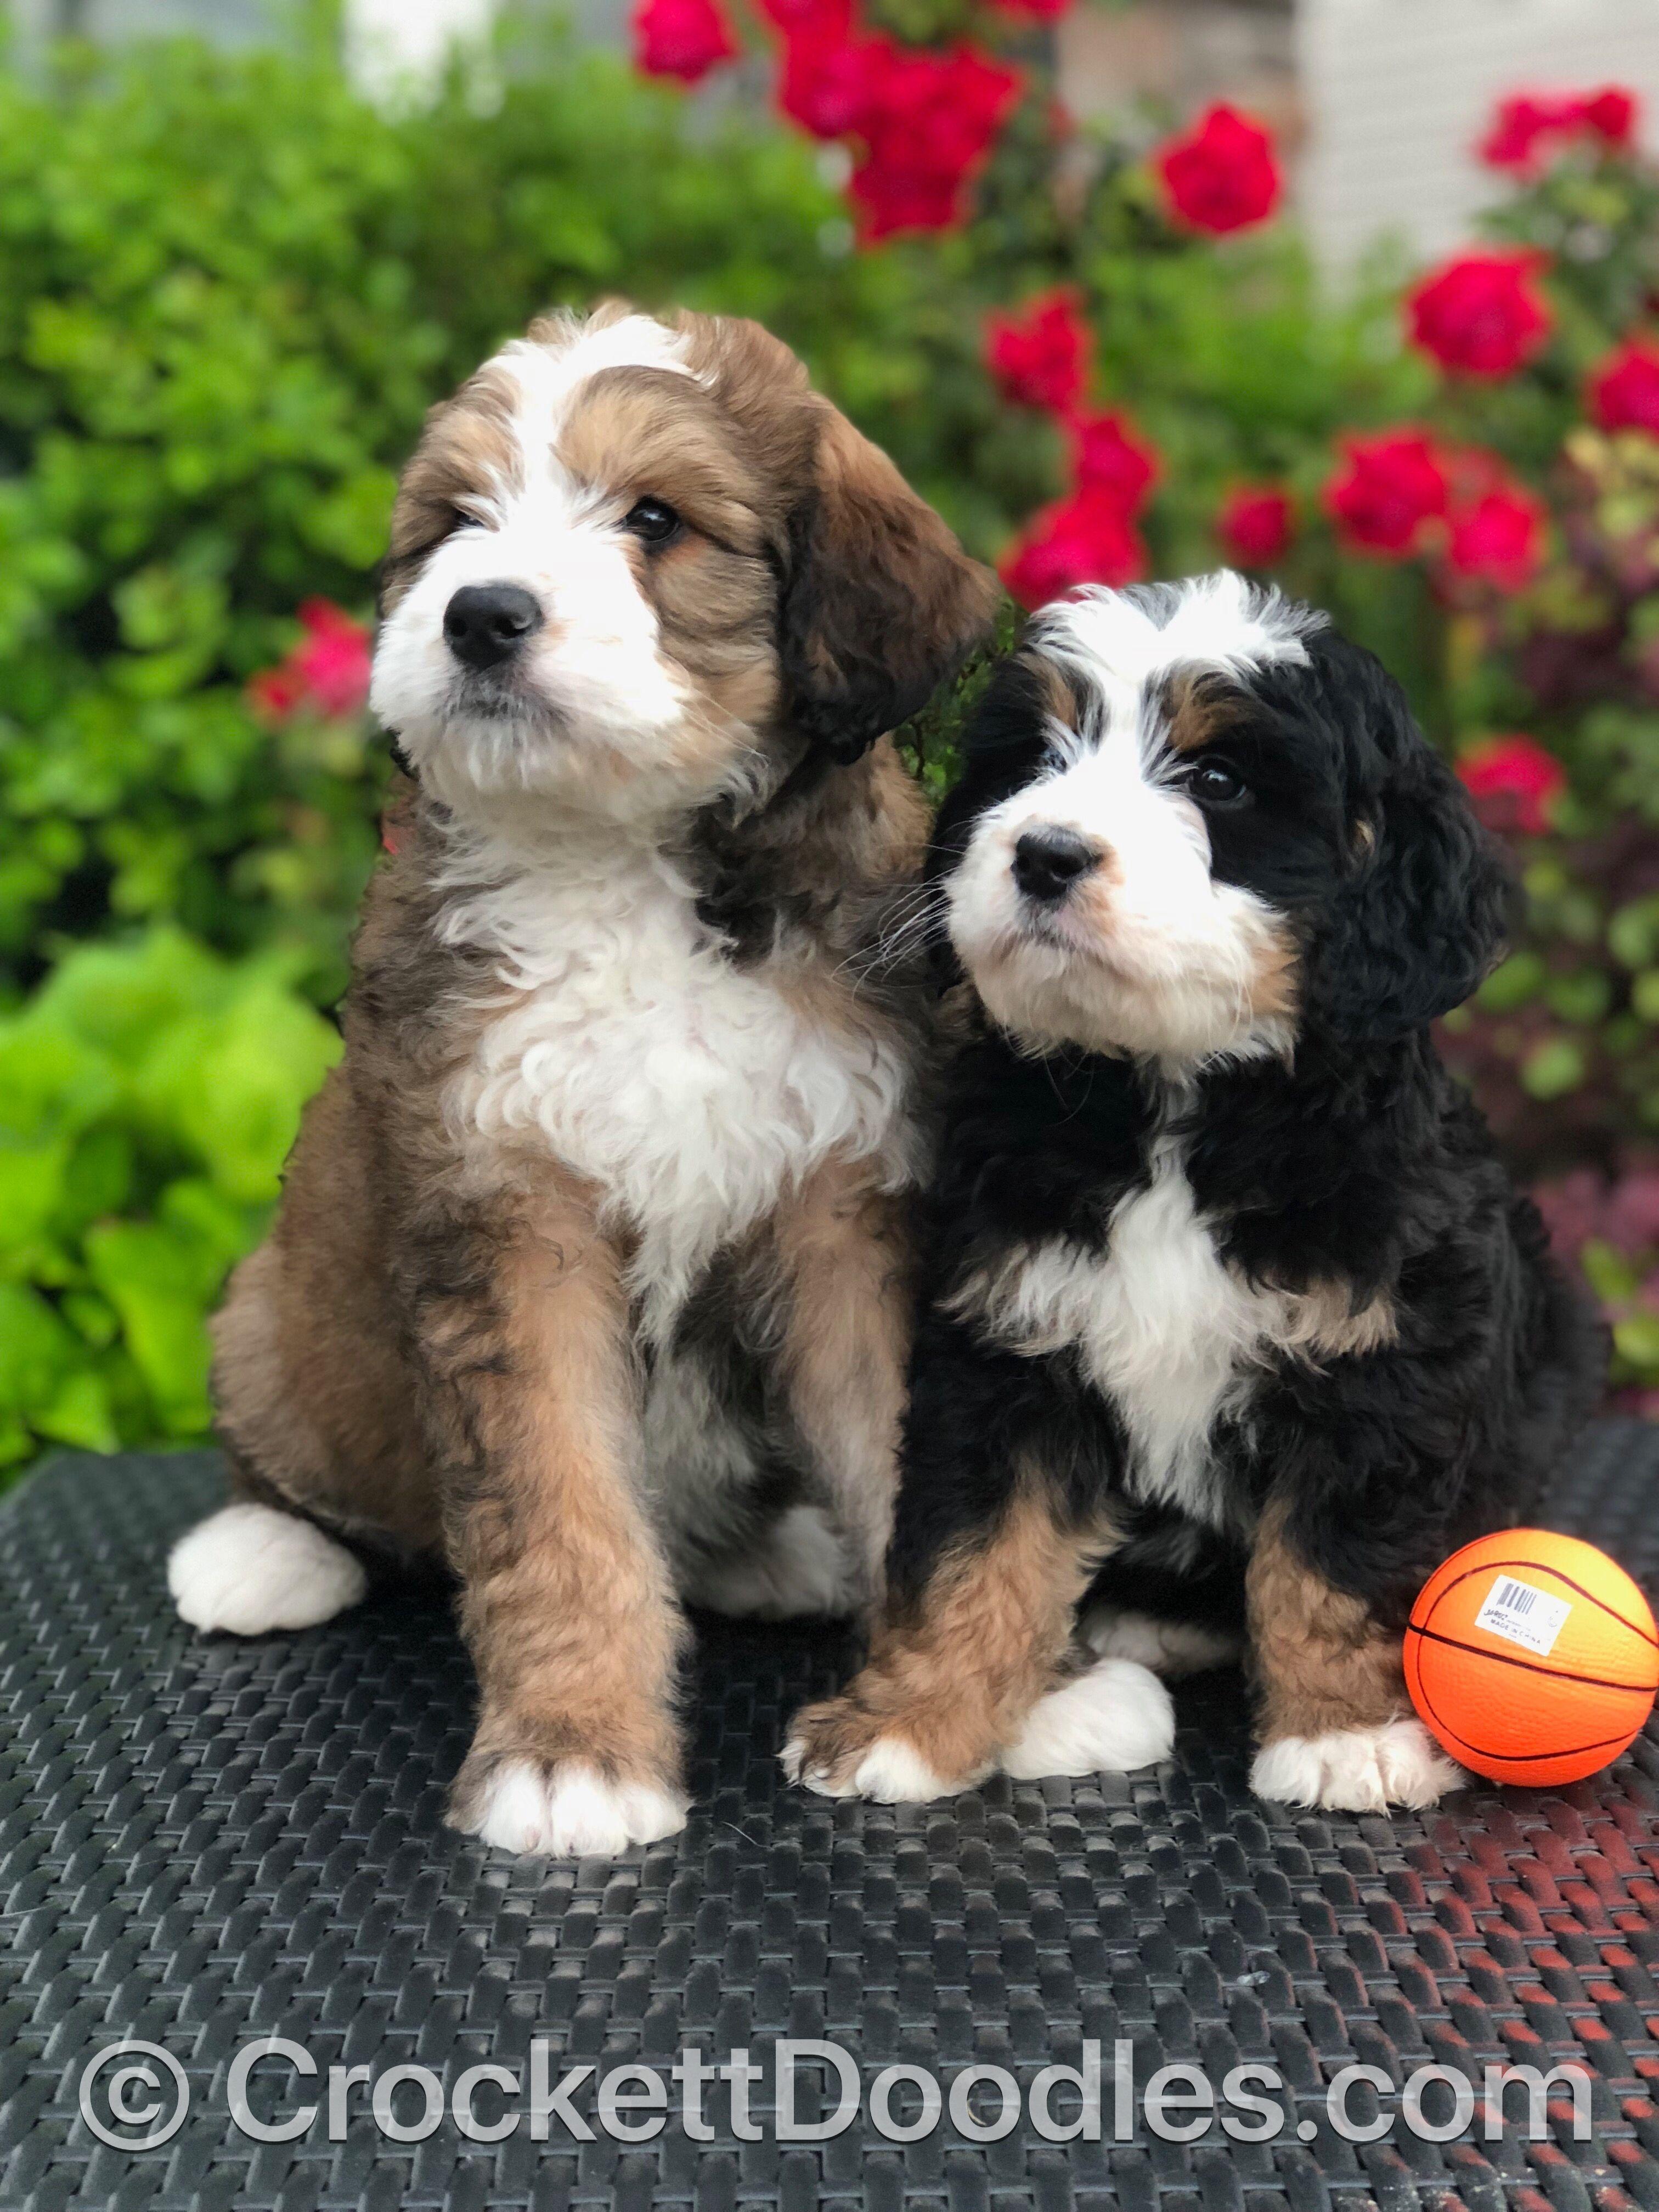 Bernedoodles From Crockett Doodles Bernedoodle Puppy Puppies Cute Animals